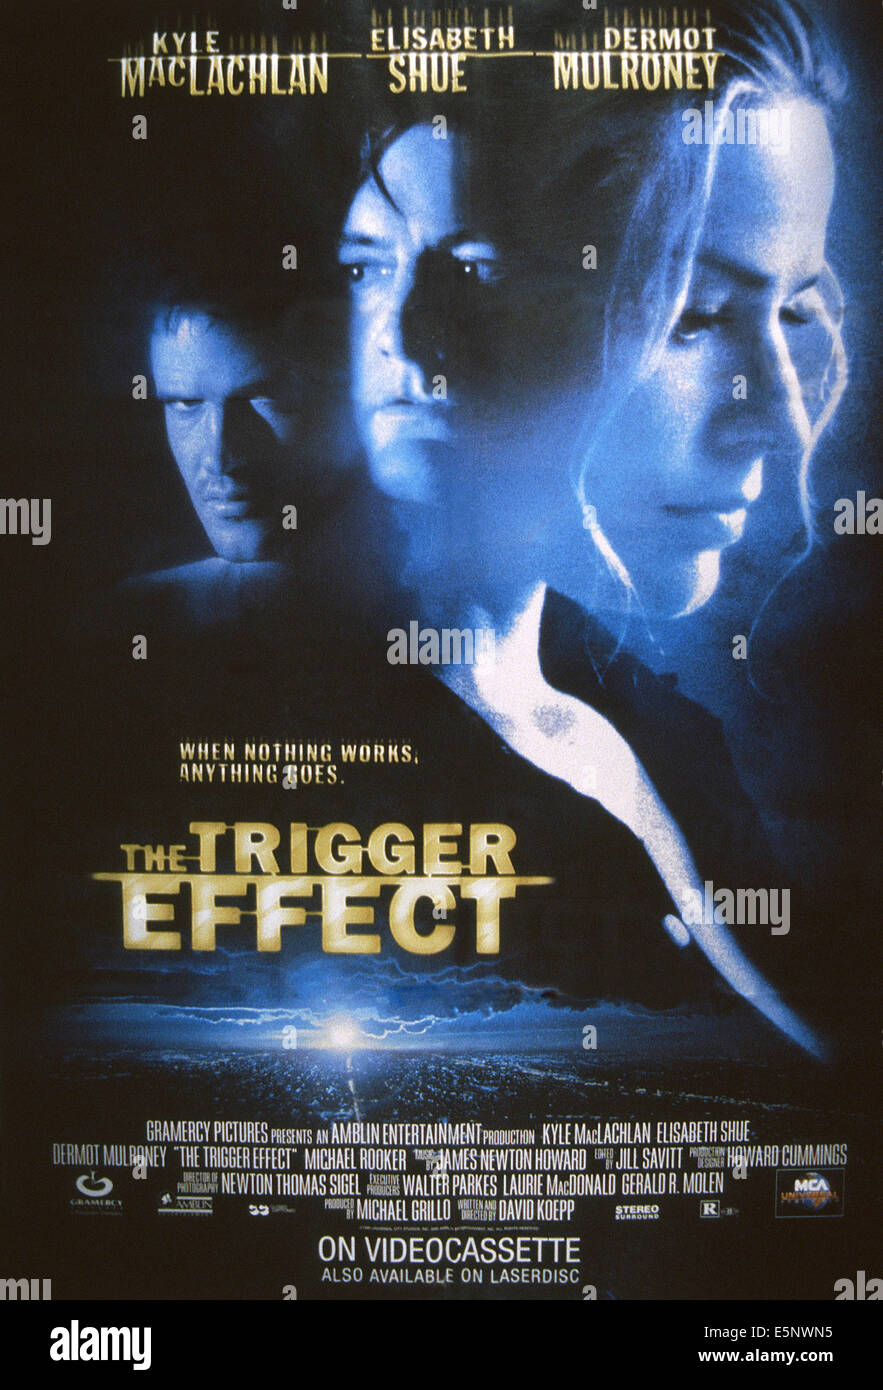 THE TRIGGER EFFECT, US poster art. from left: Dermot Mulroney, Kyle MacLachlan, Elisabeth Shue, 1996. ©Gramercy